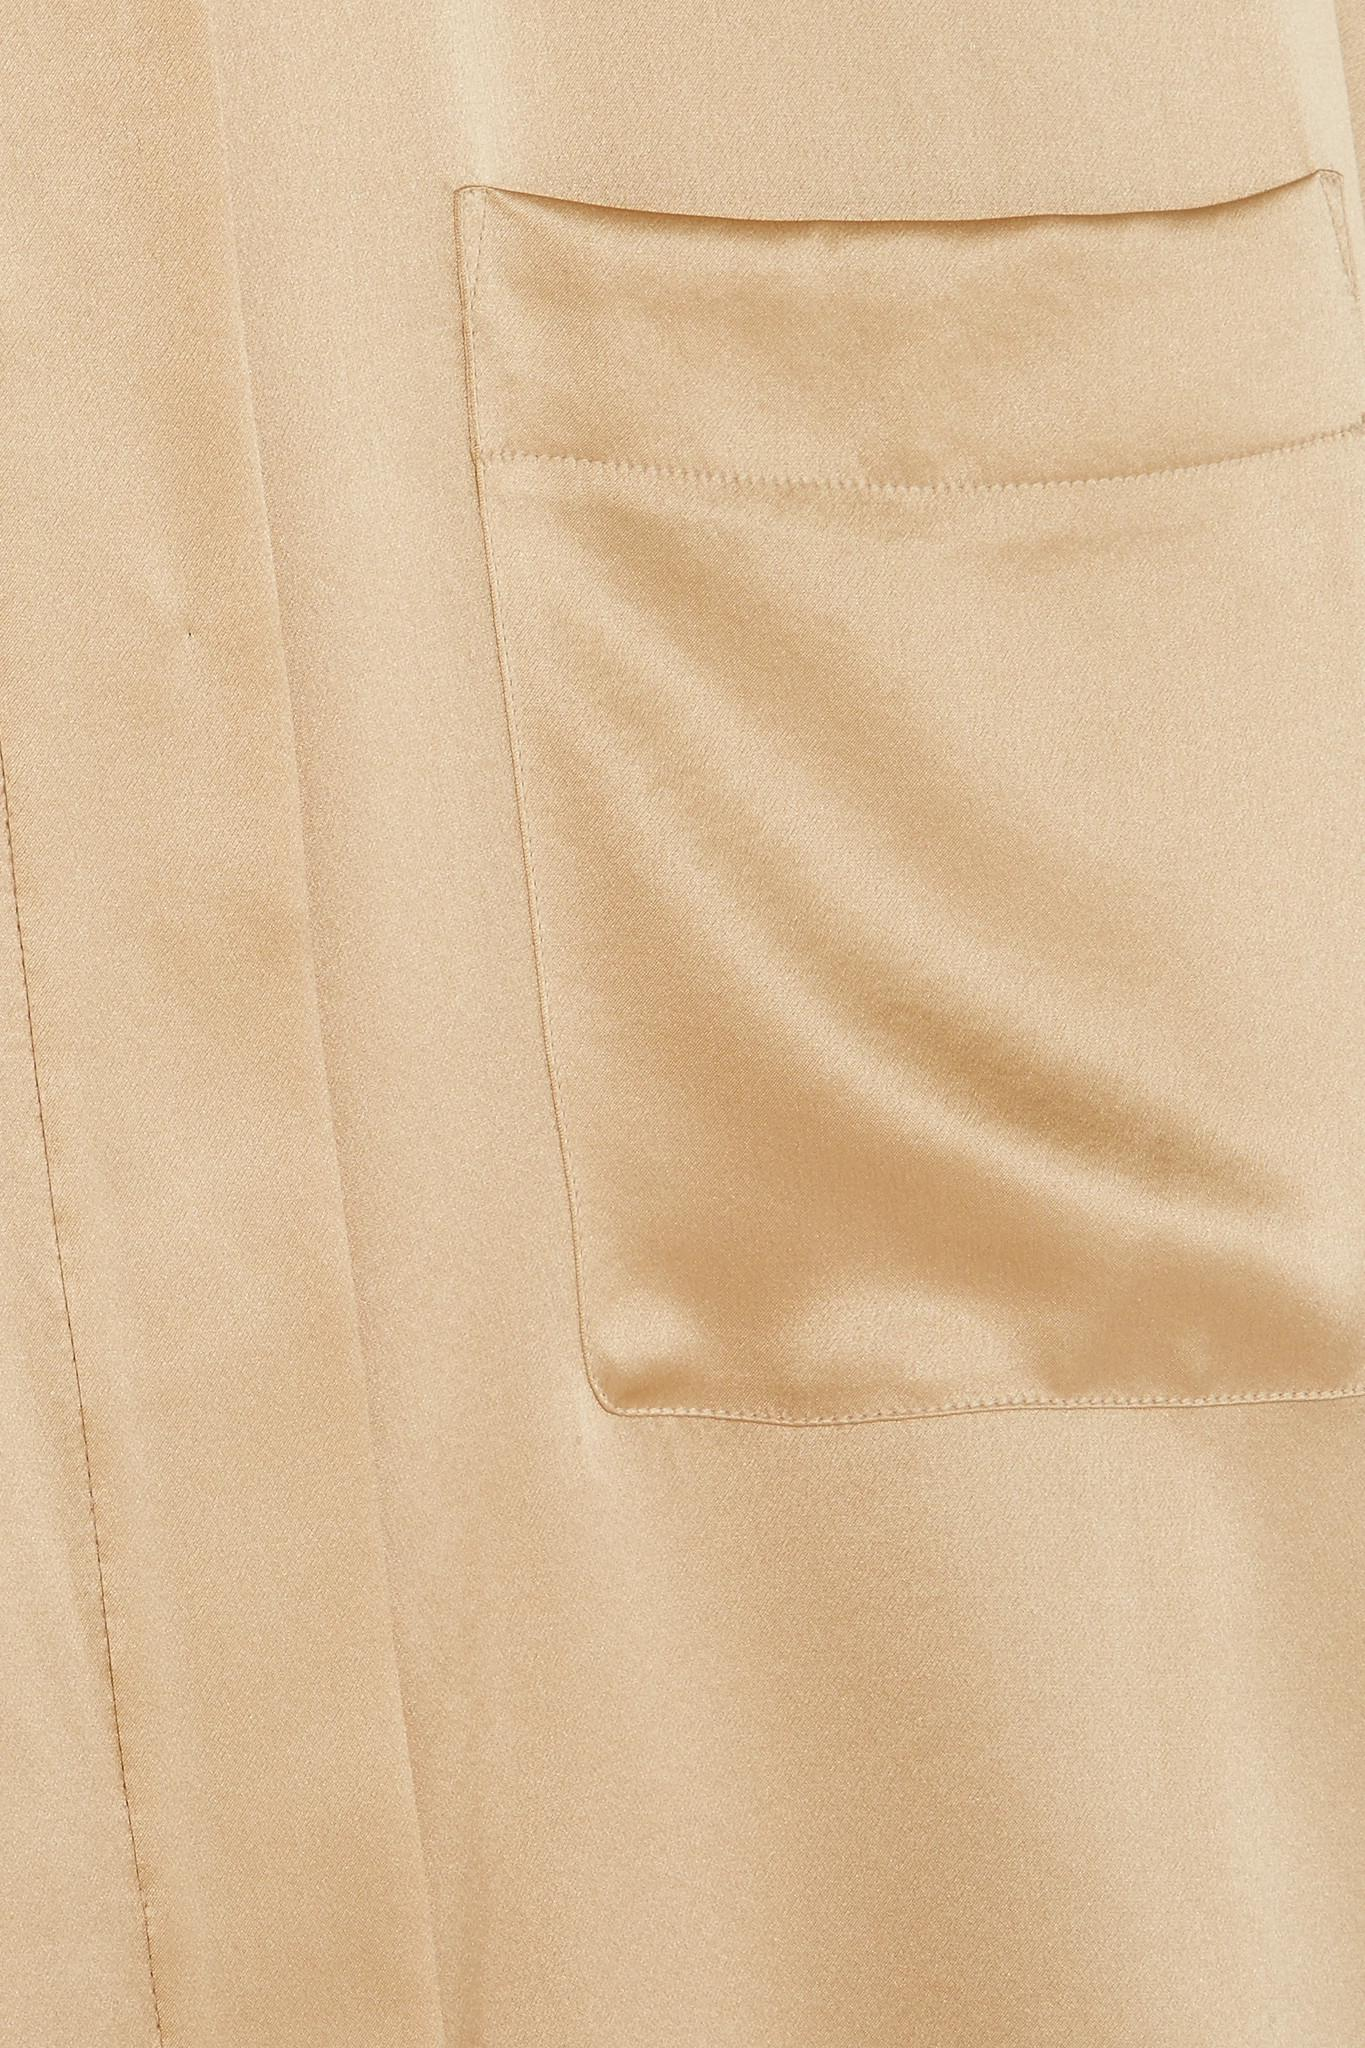 Haider Ackermann Camisa charmeuse y de seda extragrande beige wxFU7Xqf6F